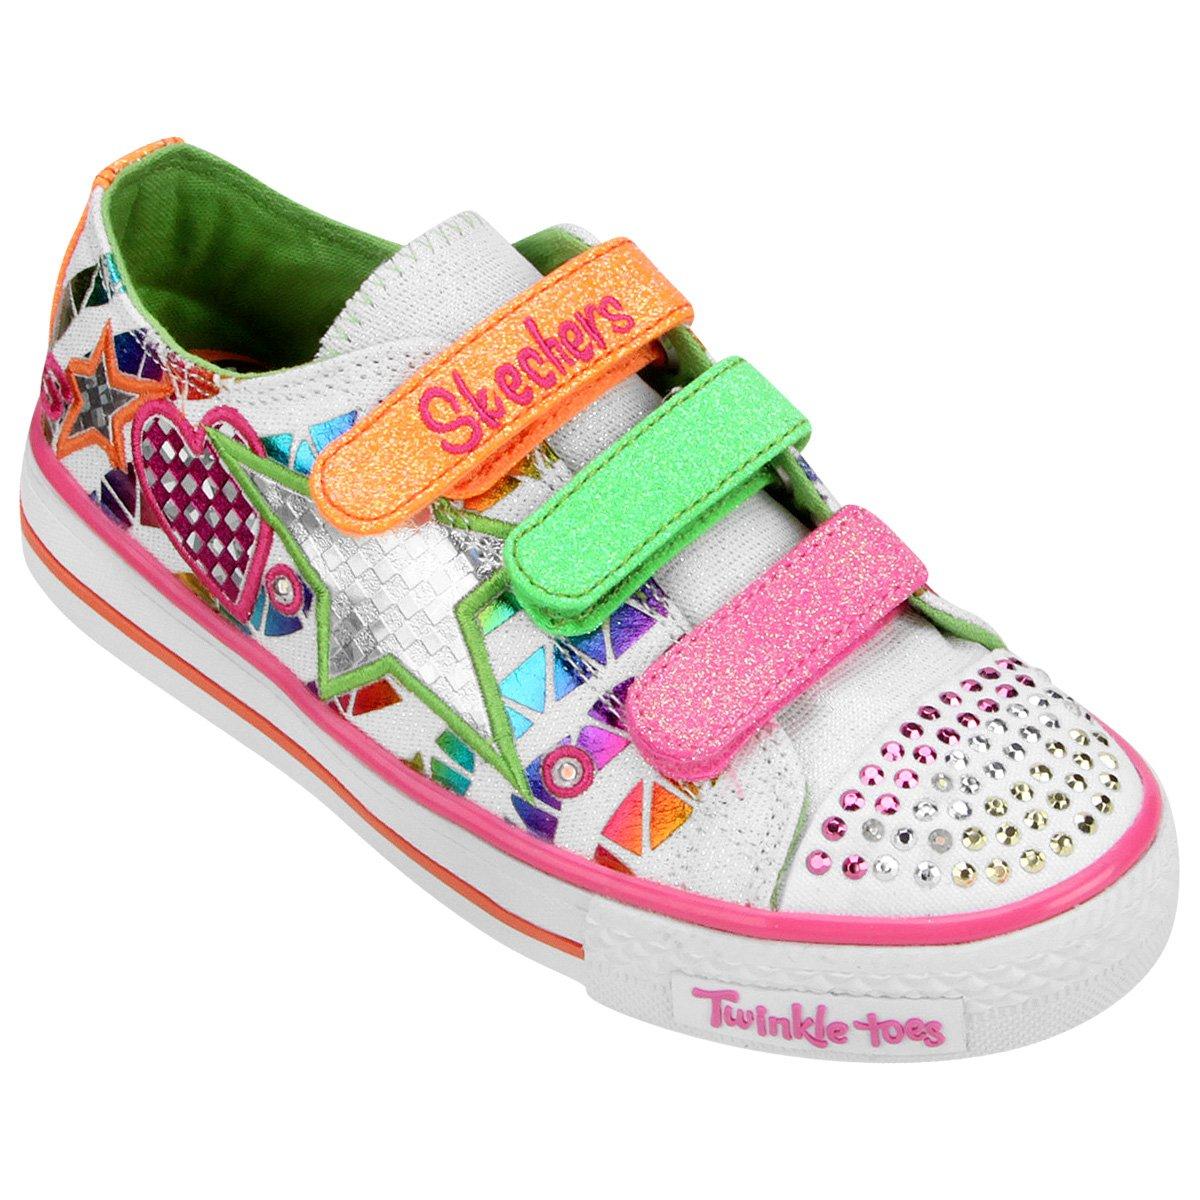 b5b44d0b4ea Tênis Skechers Twinkle Toes Shuffles Infantil - Compre Agora